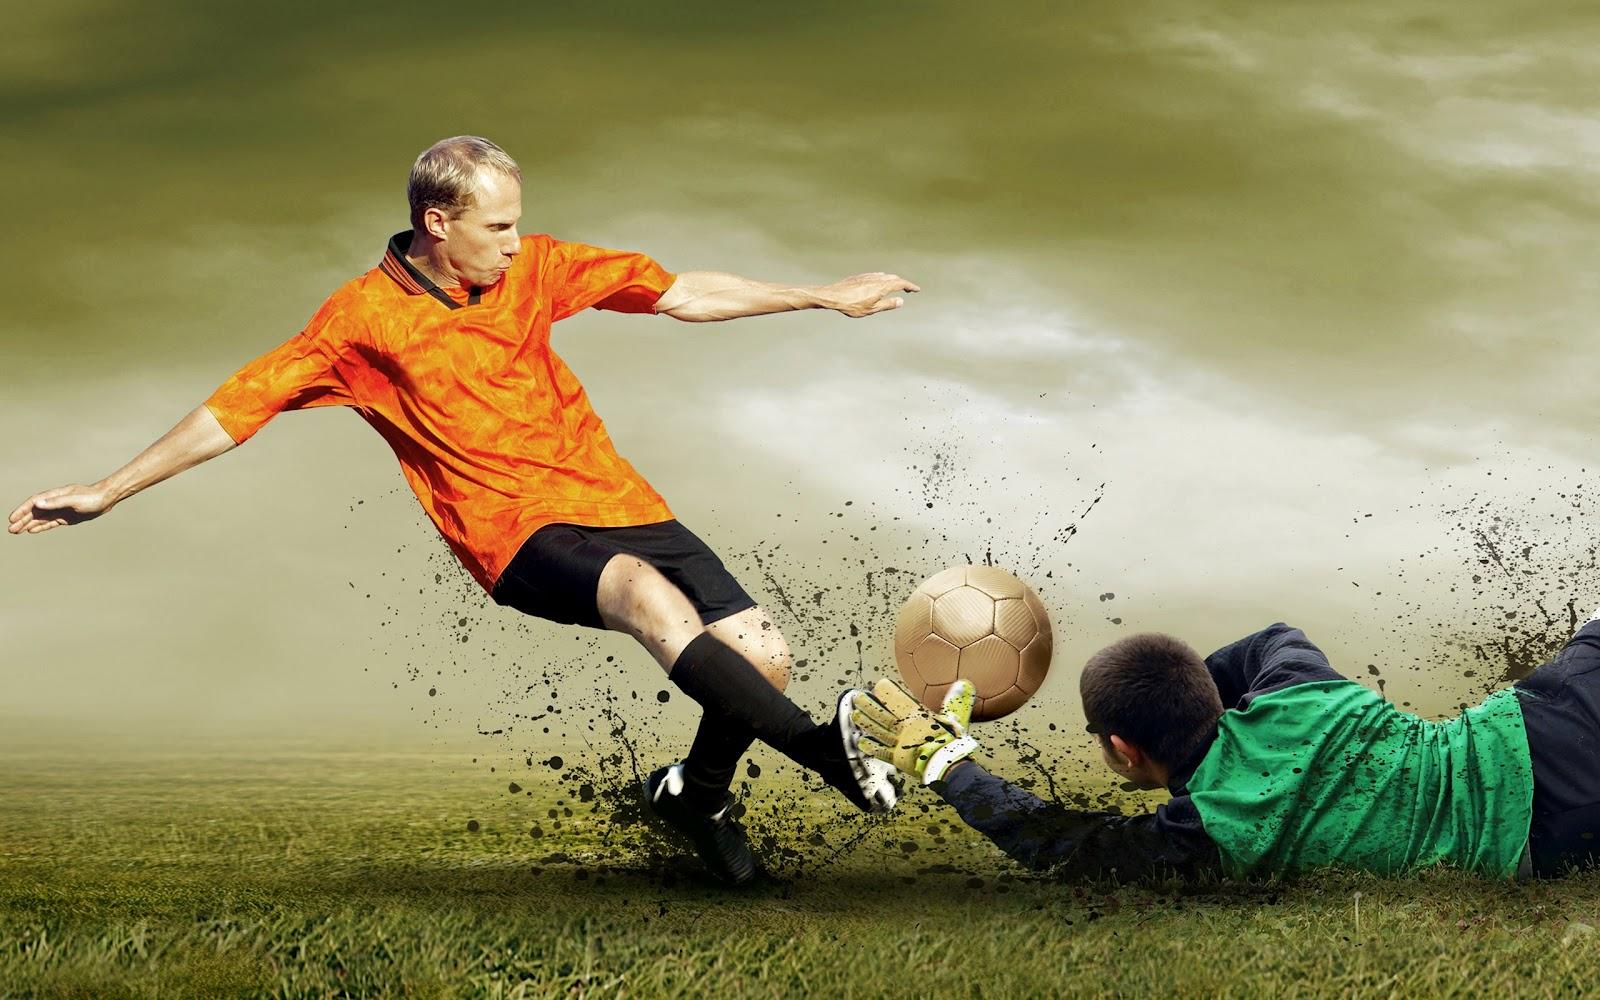 http://1.bp.blogspot.com/-fRy-cpe_5S0/UVhQpoi6xmI/AAAAAAAAXh4/5OpjoE0hOKw/s1600/football-wallpaper-12.jpg